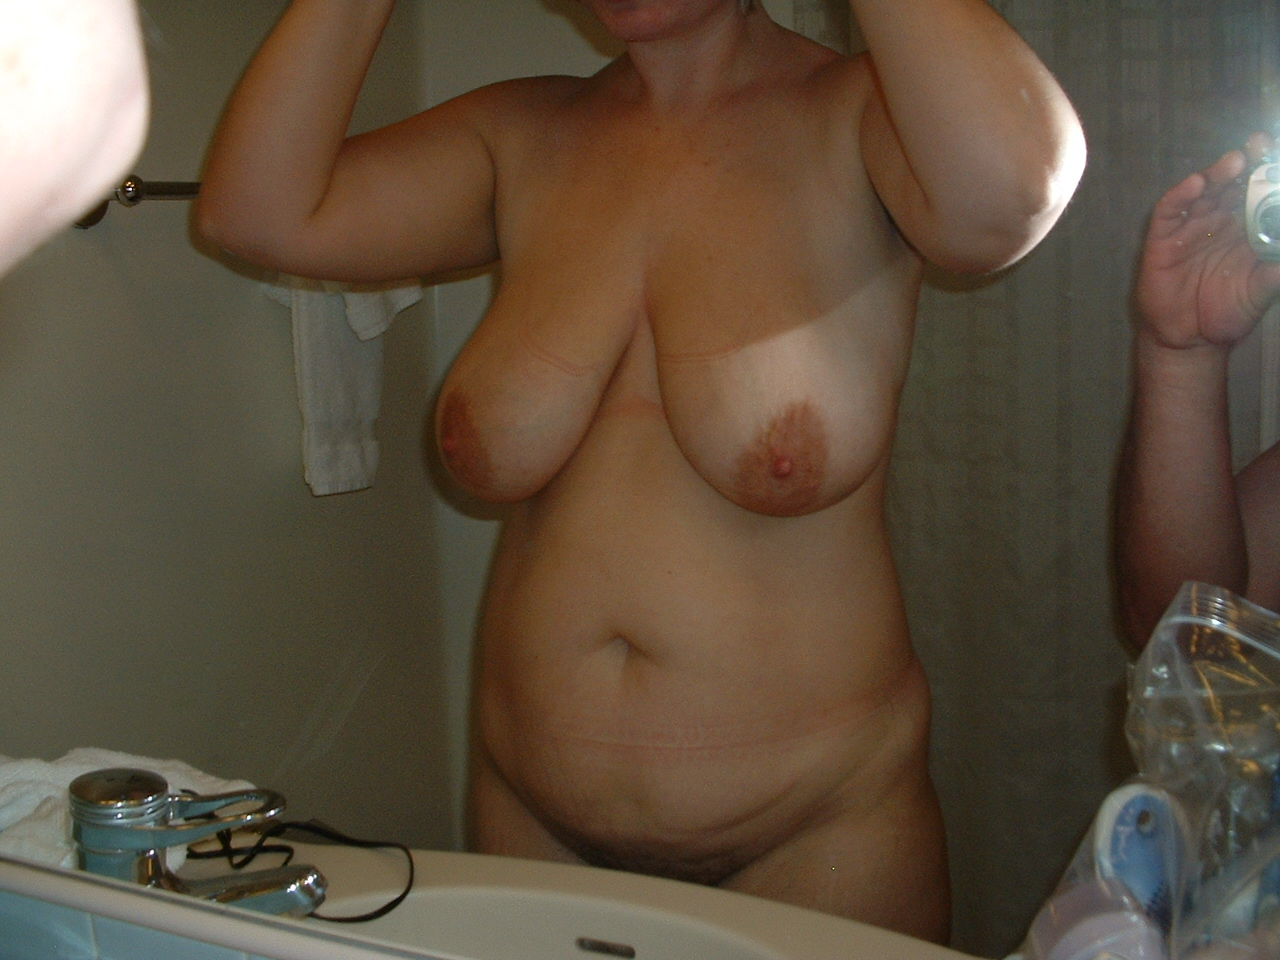 Скрытая камера порно зрелые женщины